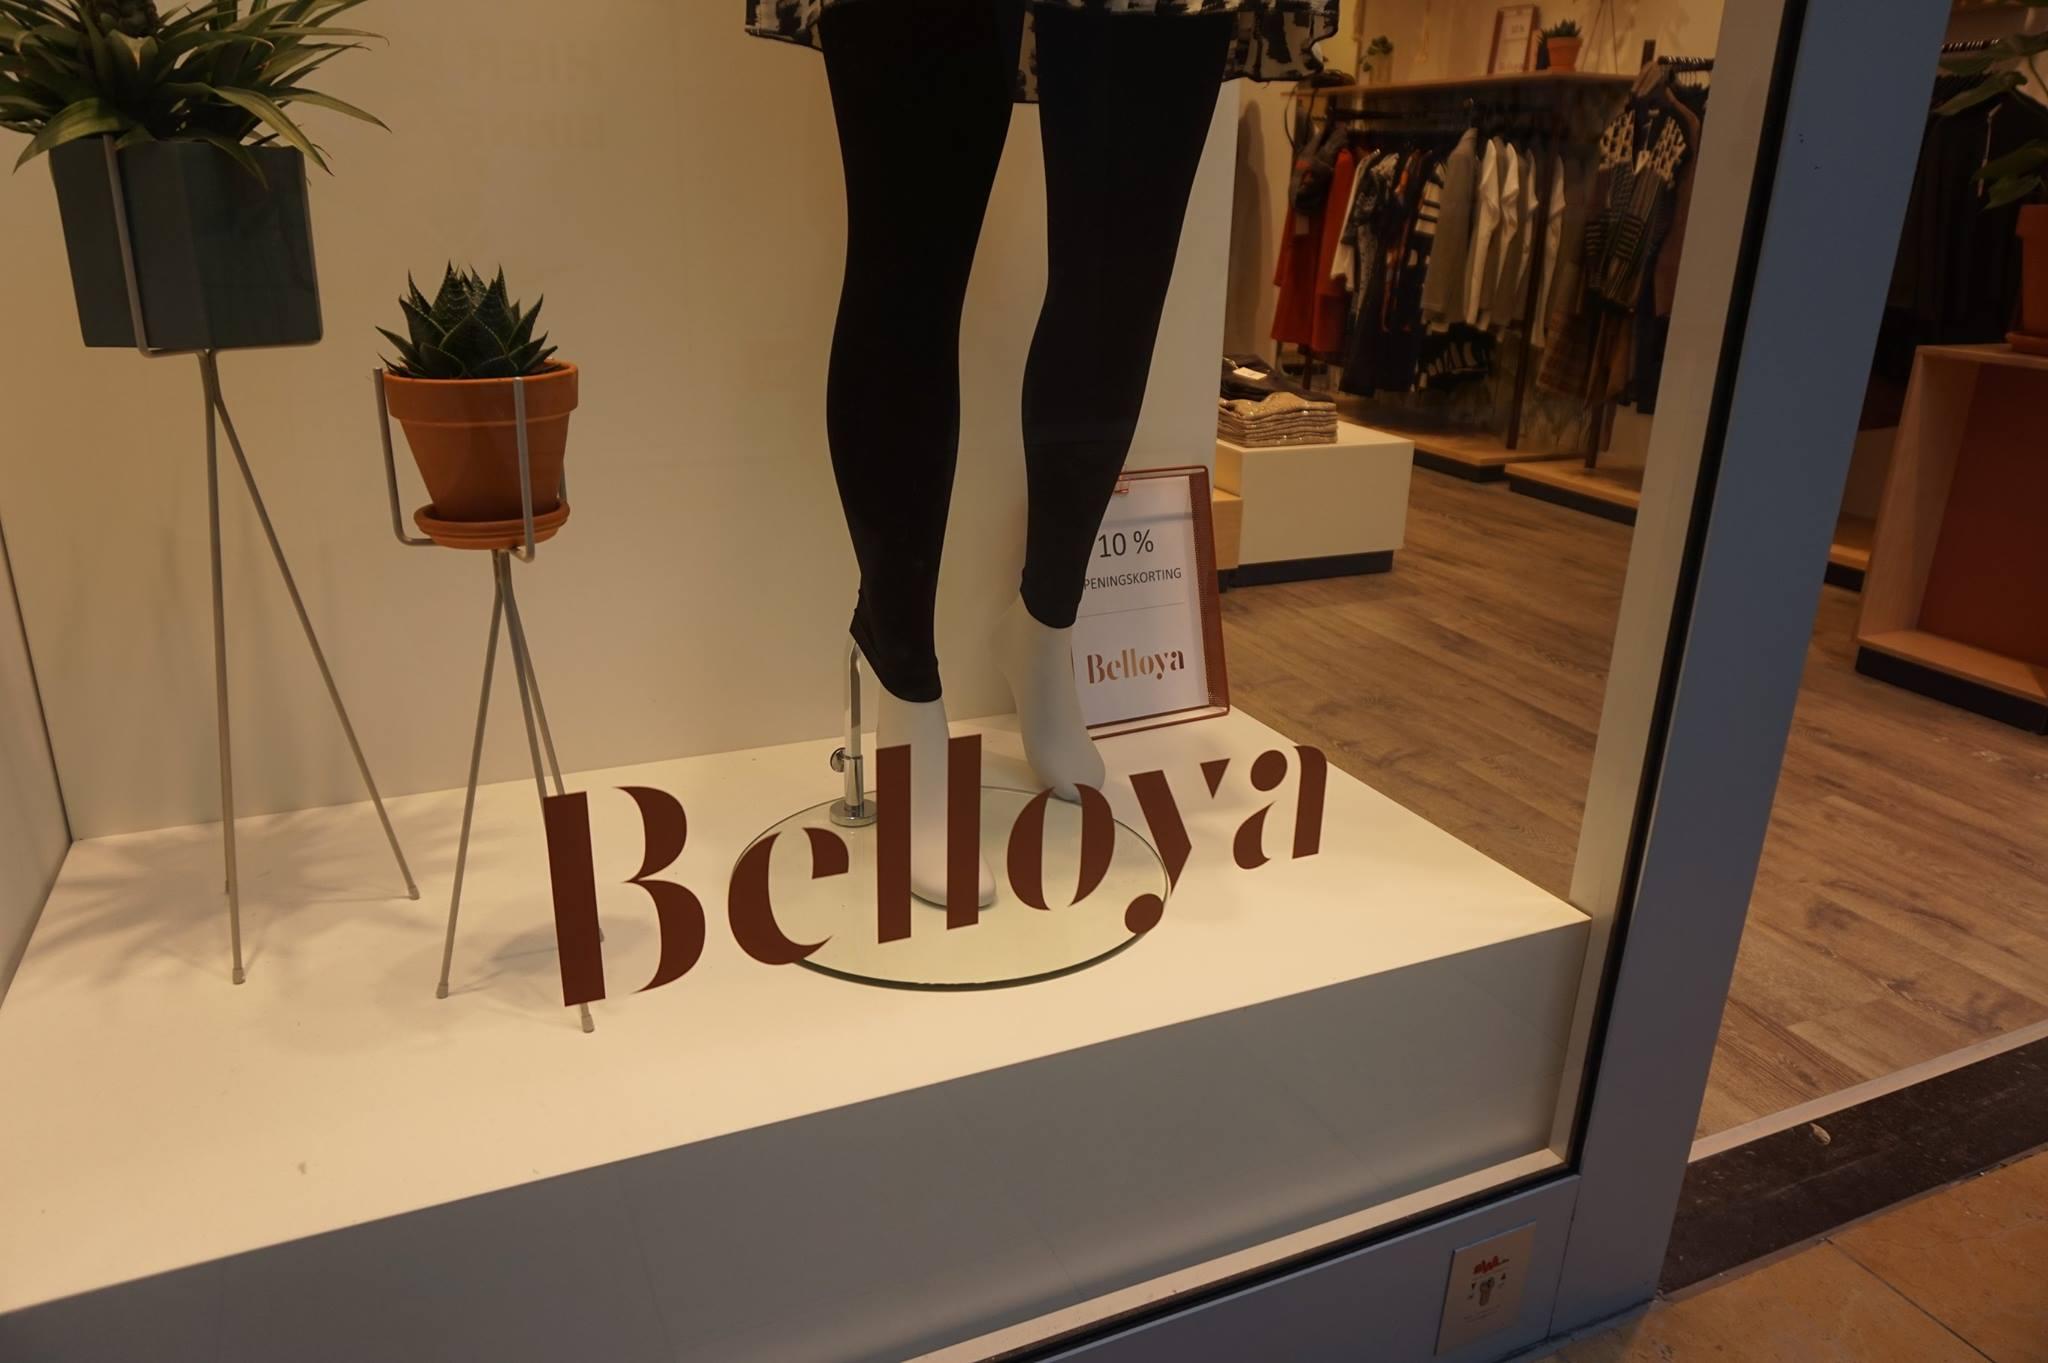 Belloya 2